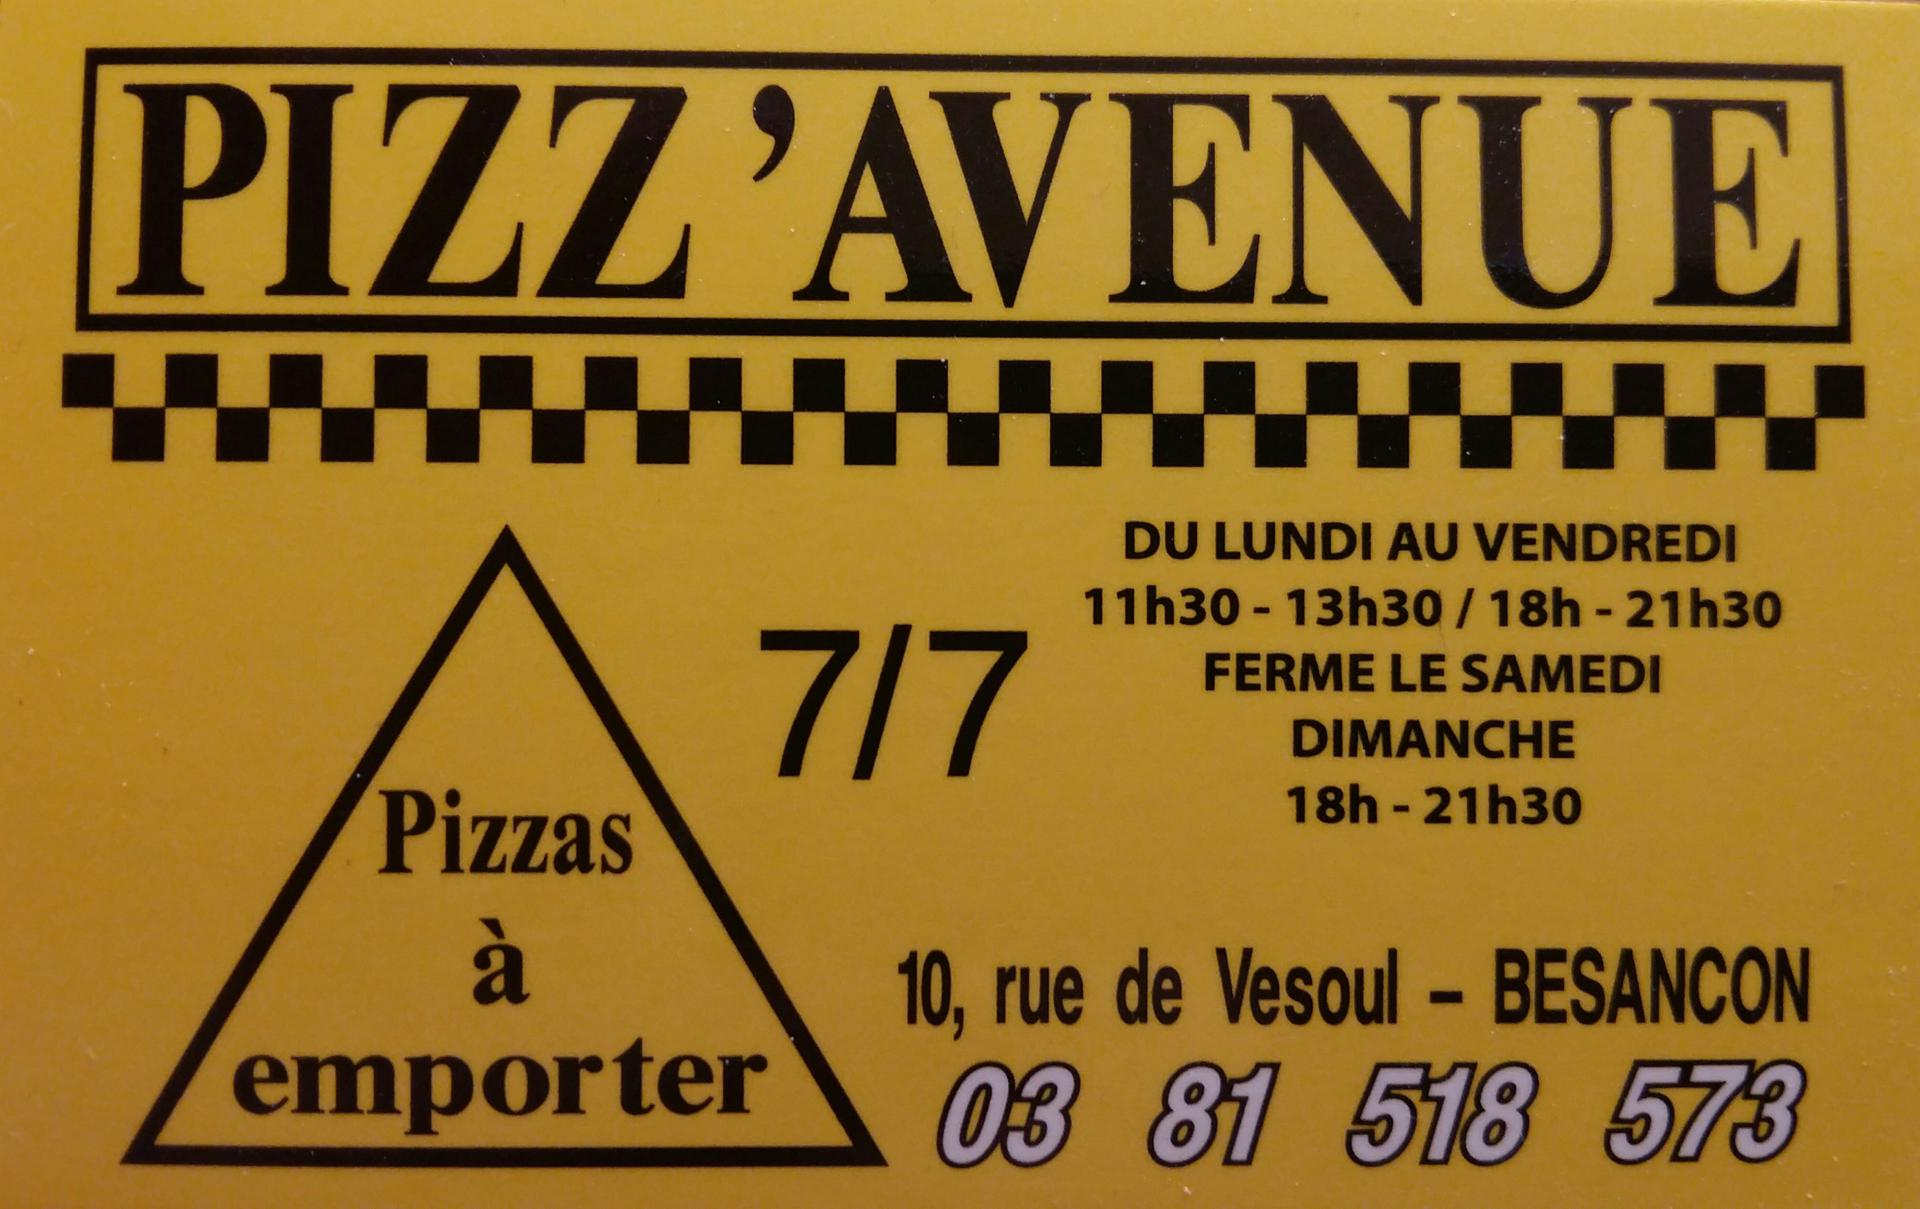 Pizz'Avenue pizzeria